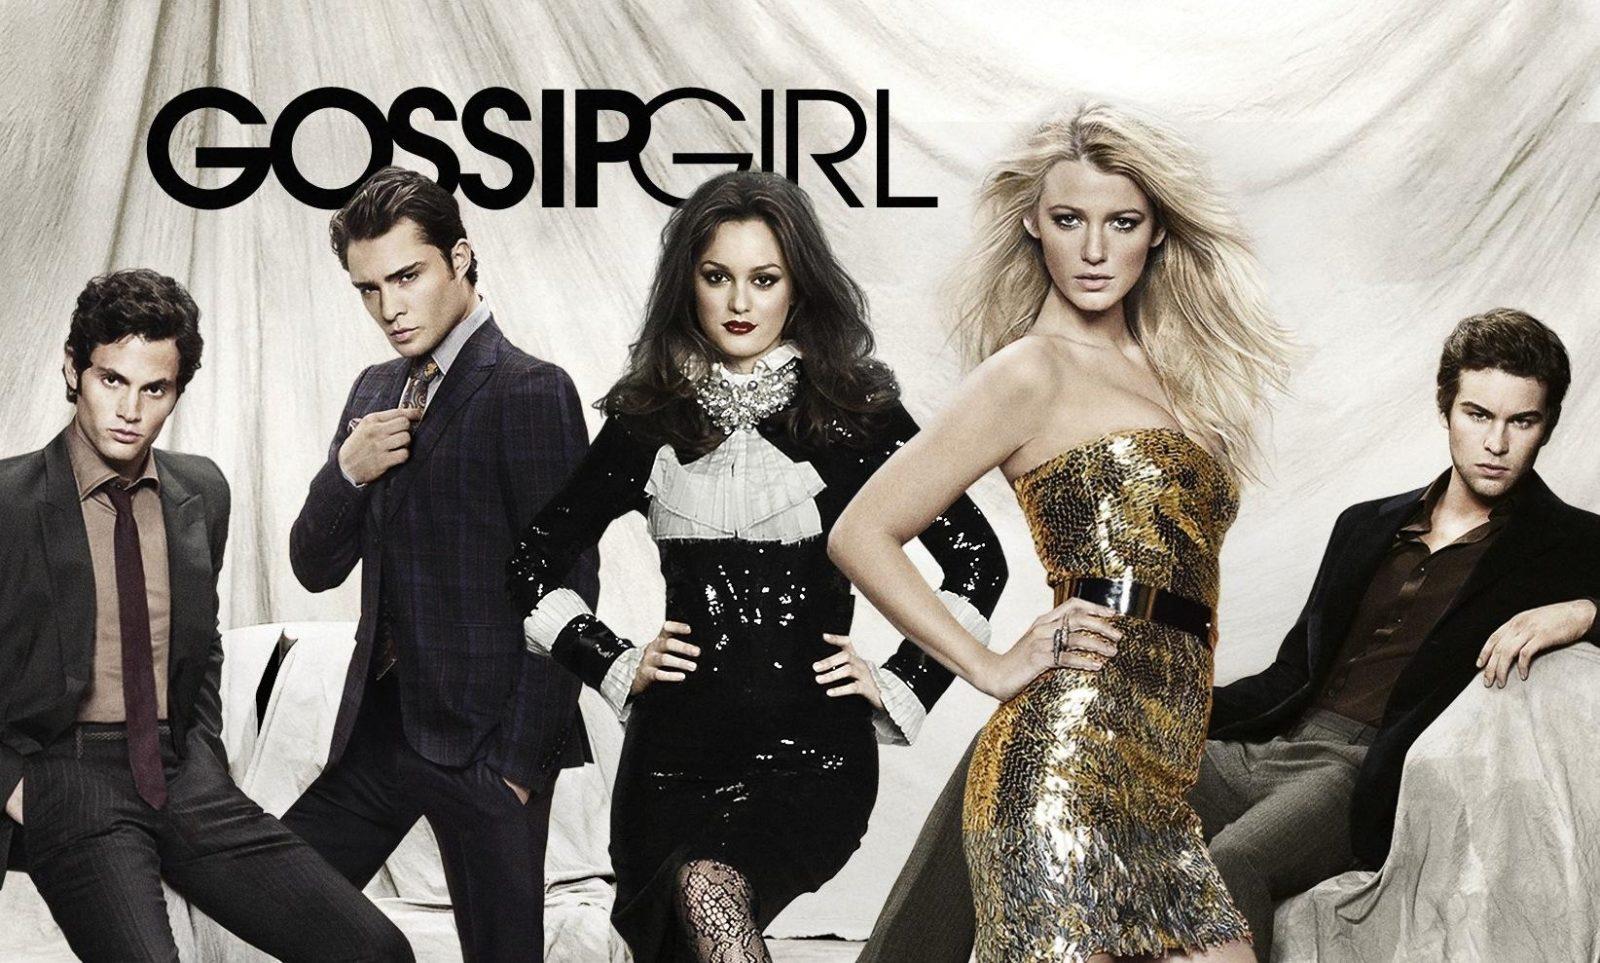 1 gennaio 2019: torna Gossip Girl su Netflix Italia